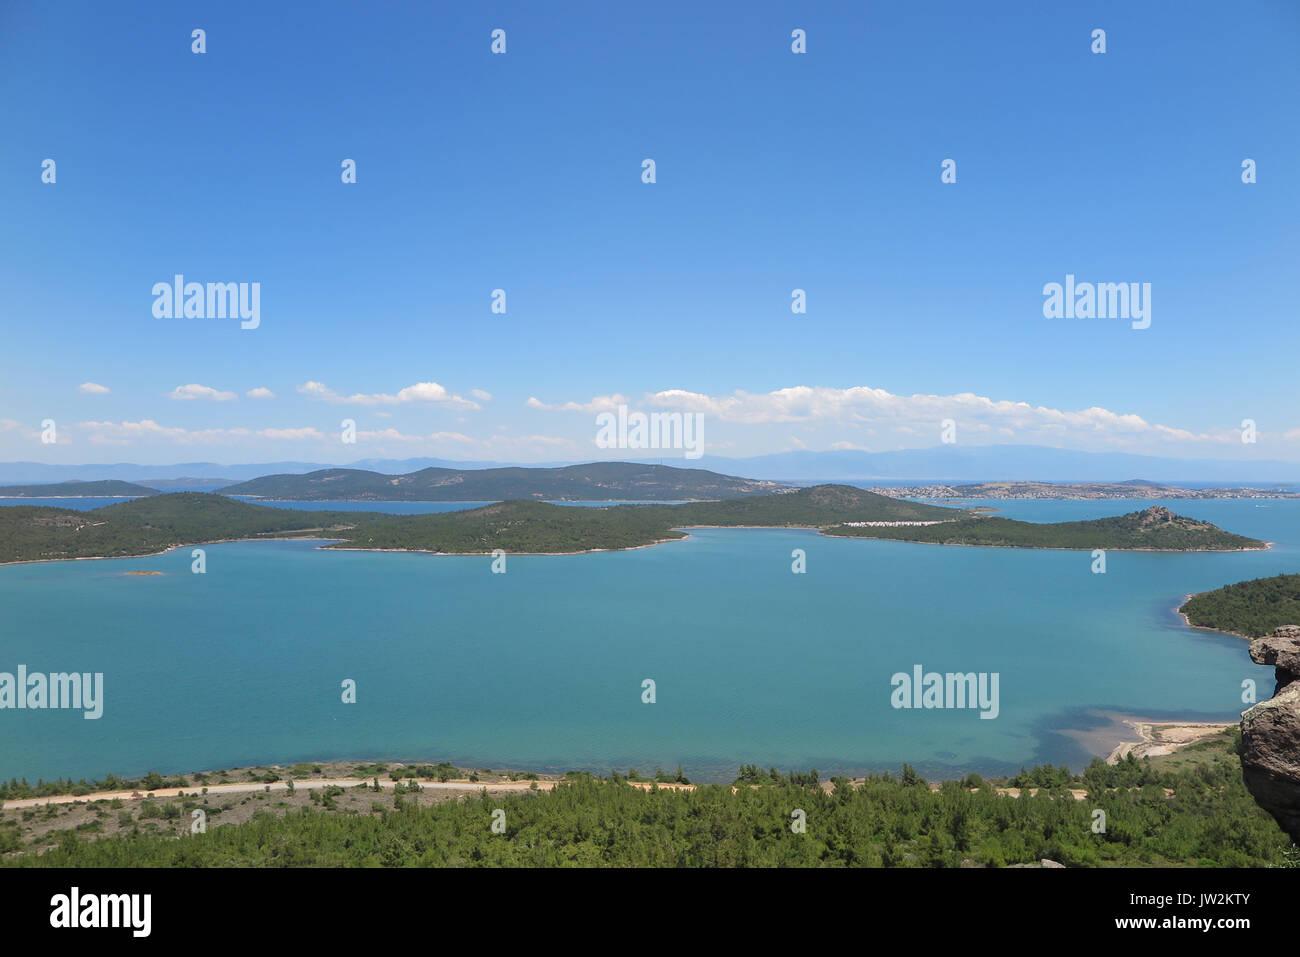 View from Devil's Table ( Seytan Sofrasi ), Ayvalik, Balikesir, Turkey - Stock Image